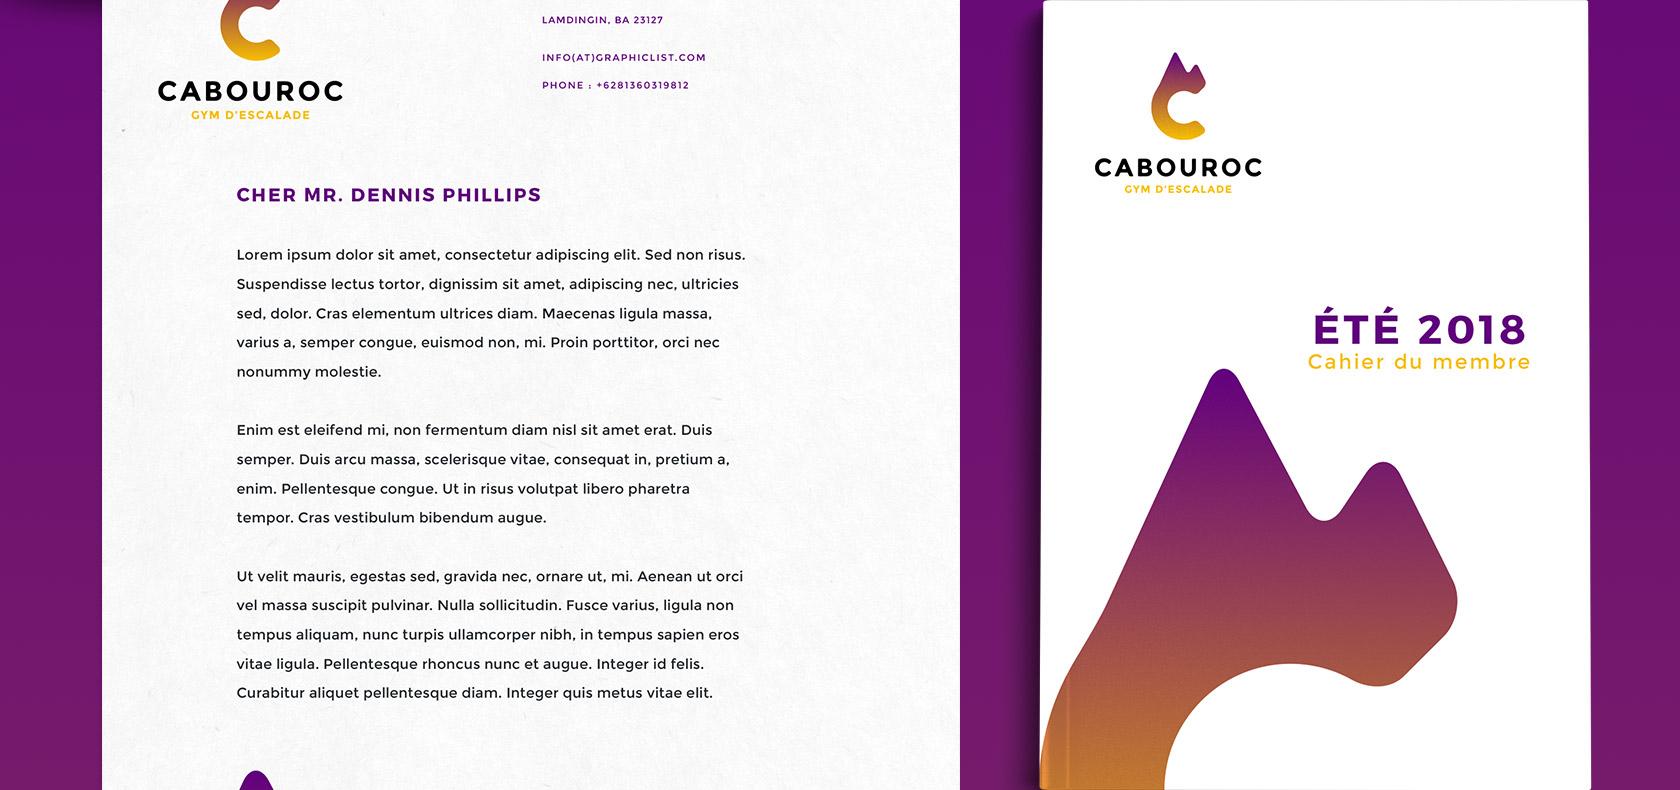 Agence-Phosphore-Portfolio-Branding-Cabouroc_04